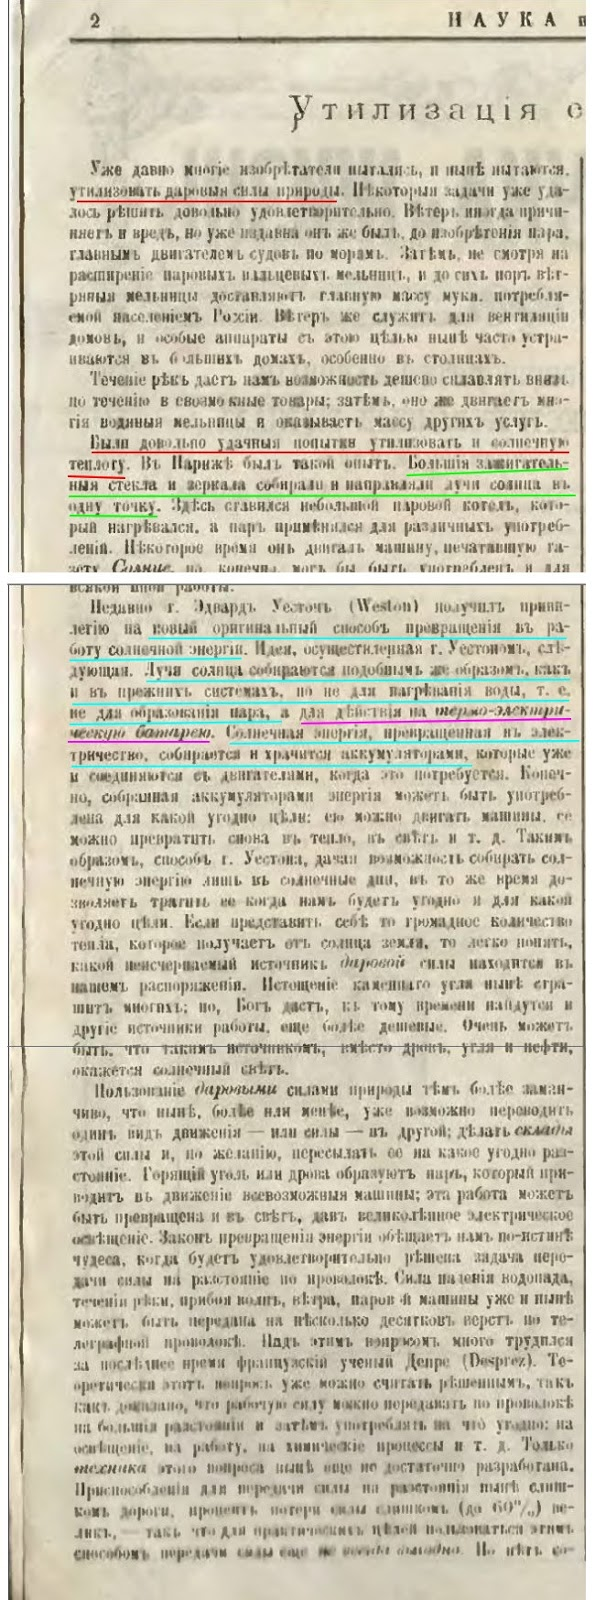 Листая старые трактаты